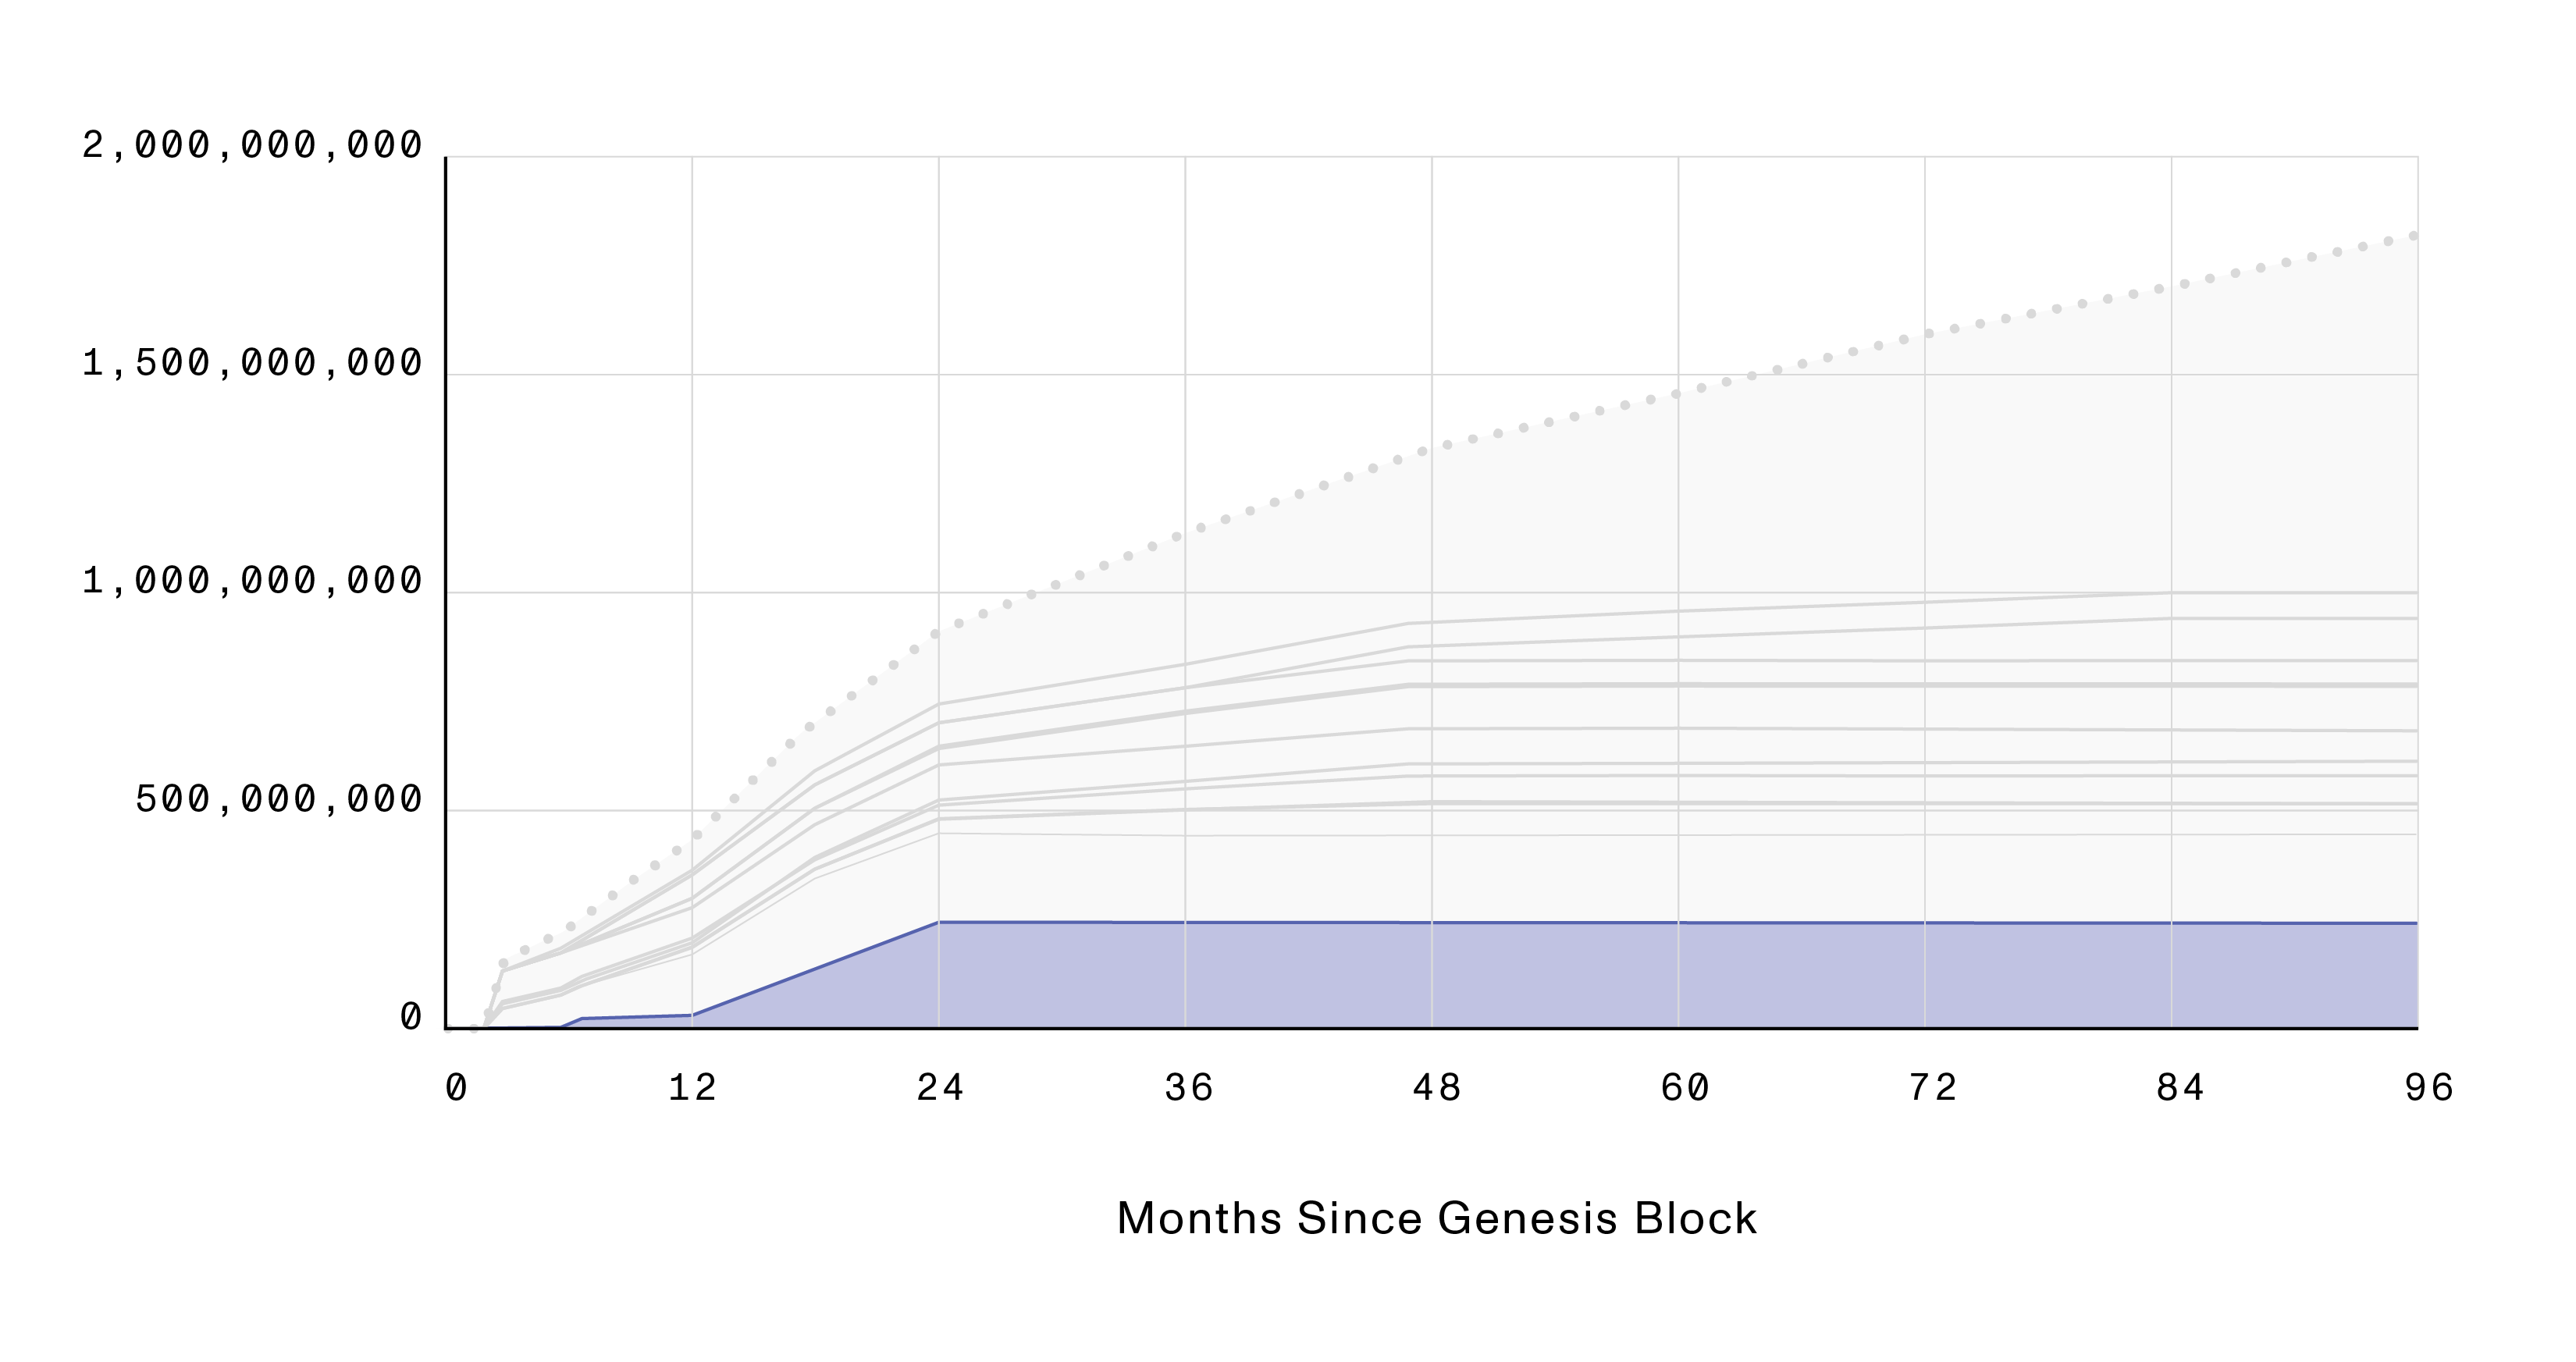 31.Core Contributors Distribution 02182021-01